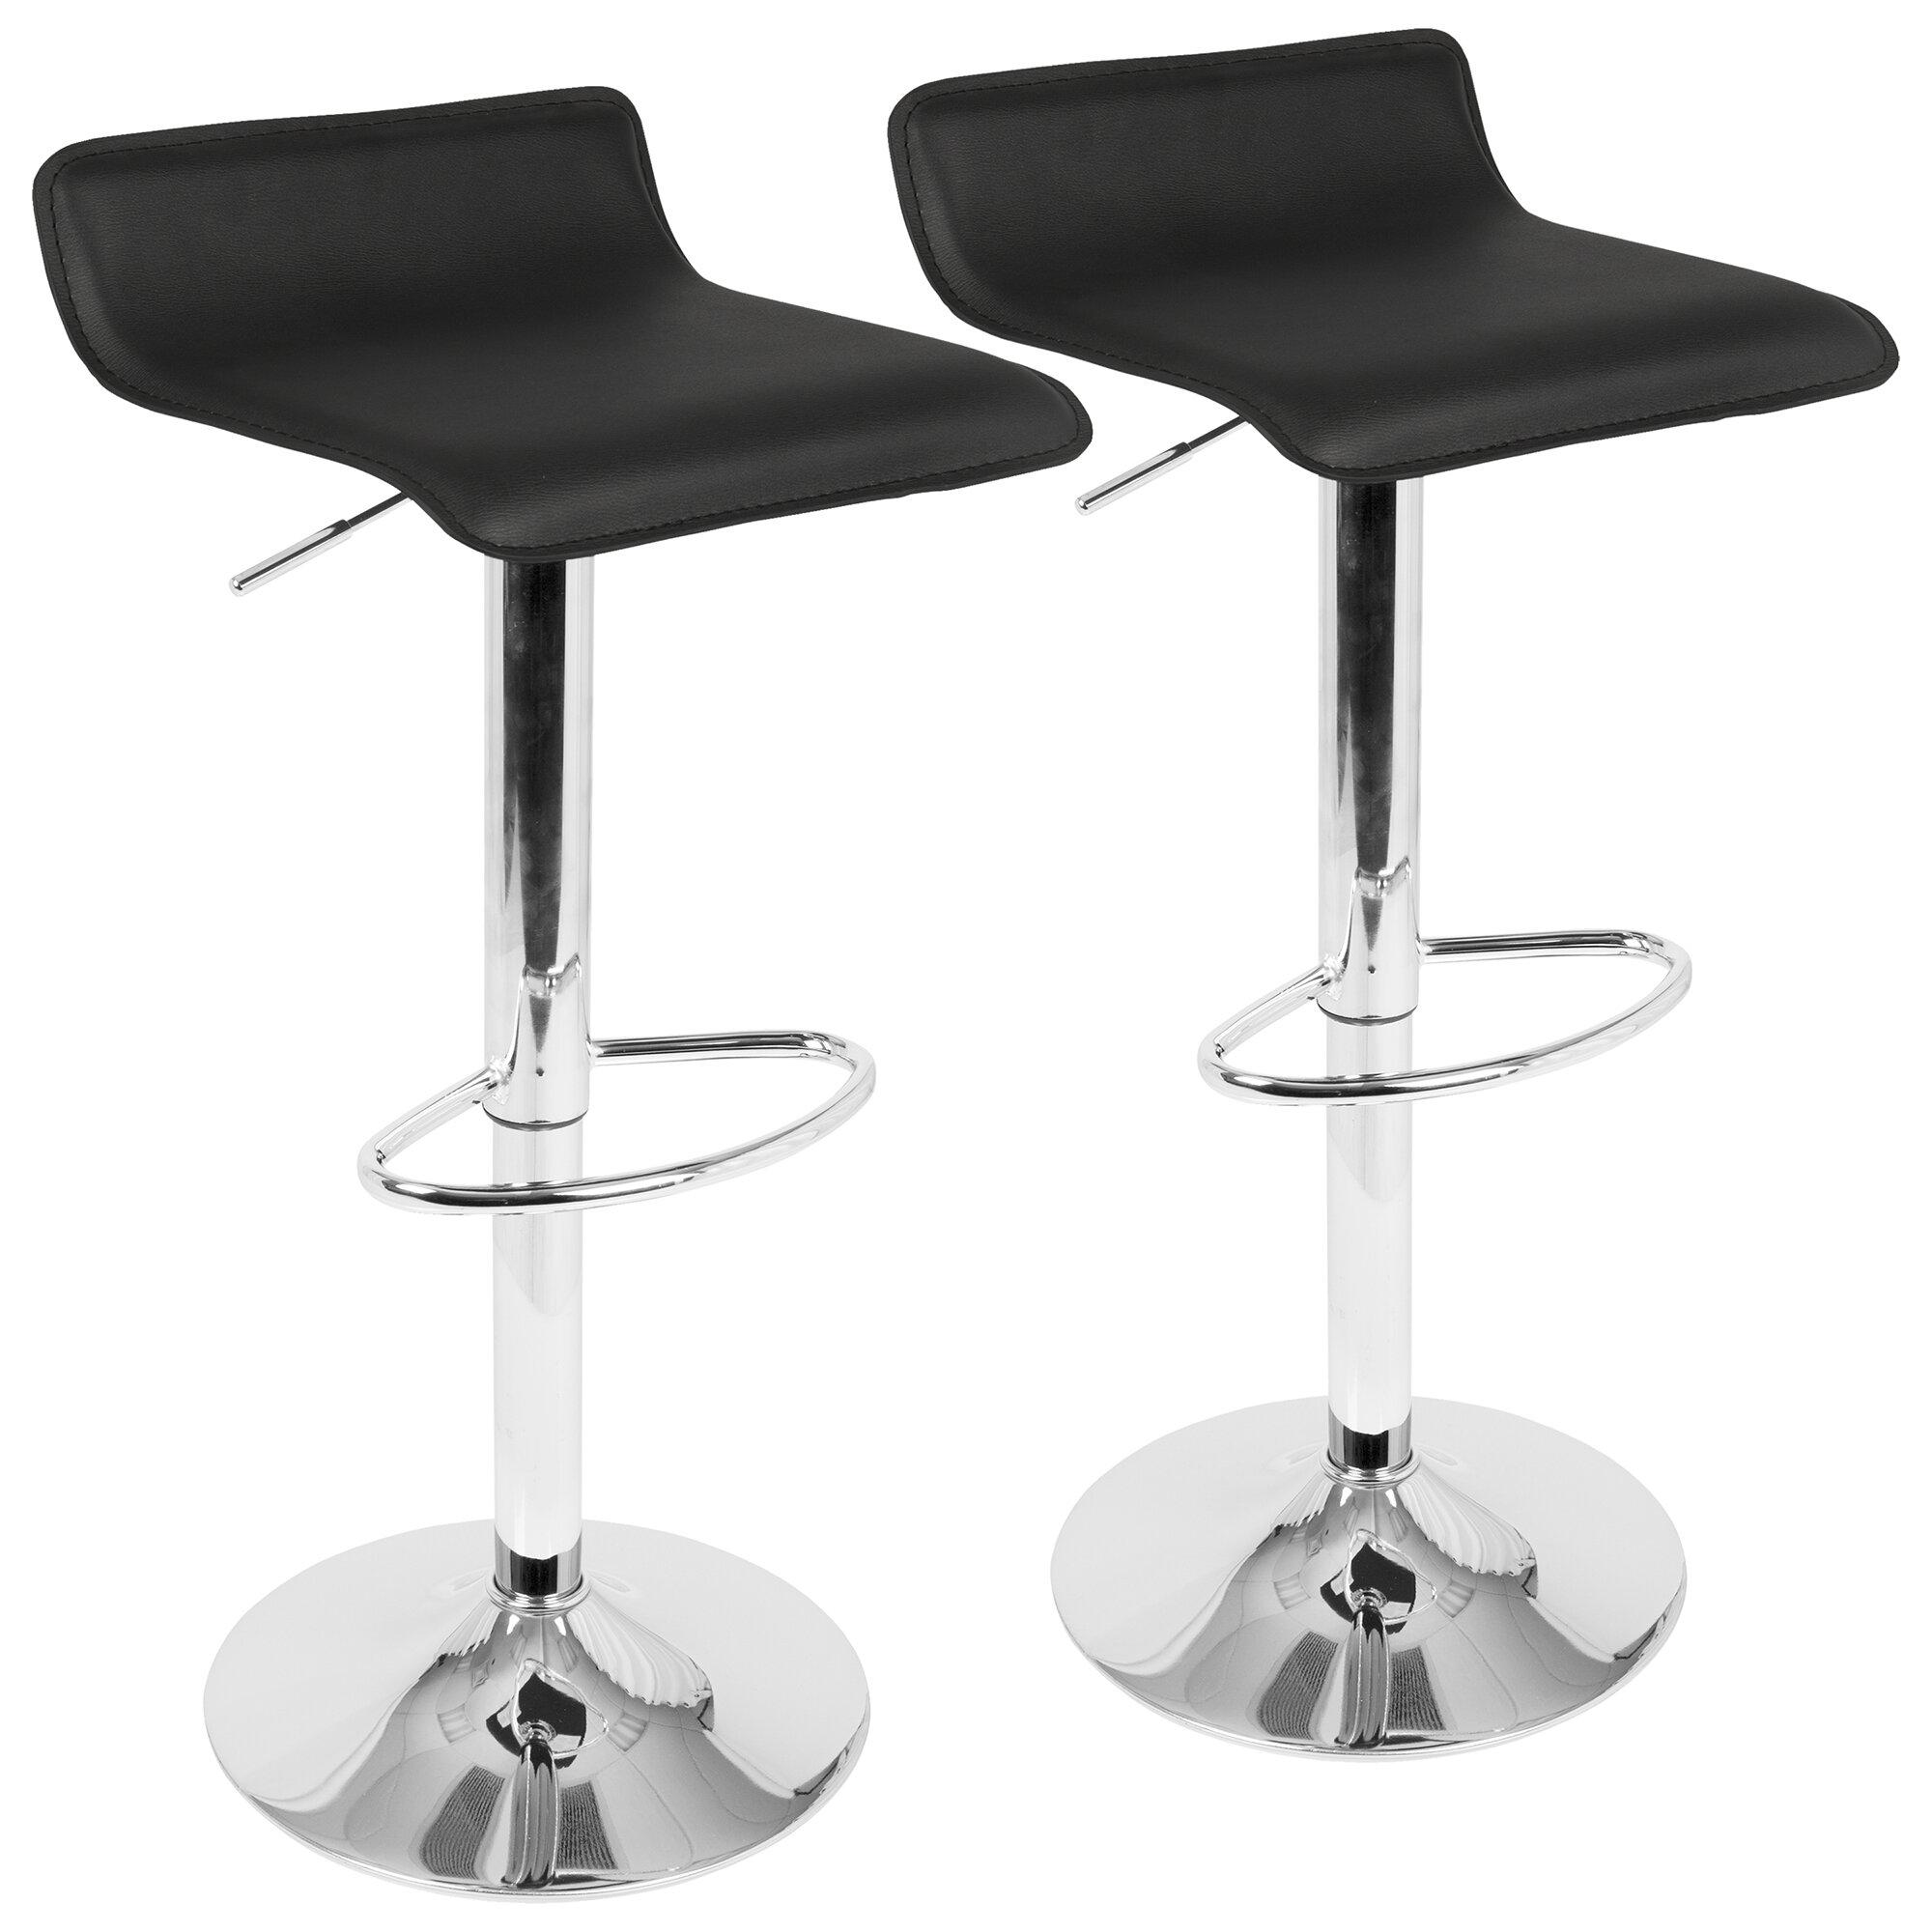 Outstanding Camargo Adjustable Height Swivel Bar Stool Lamtechconsult Wood Chair Design Ideas Lamtechconsultcom